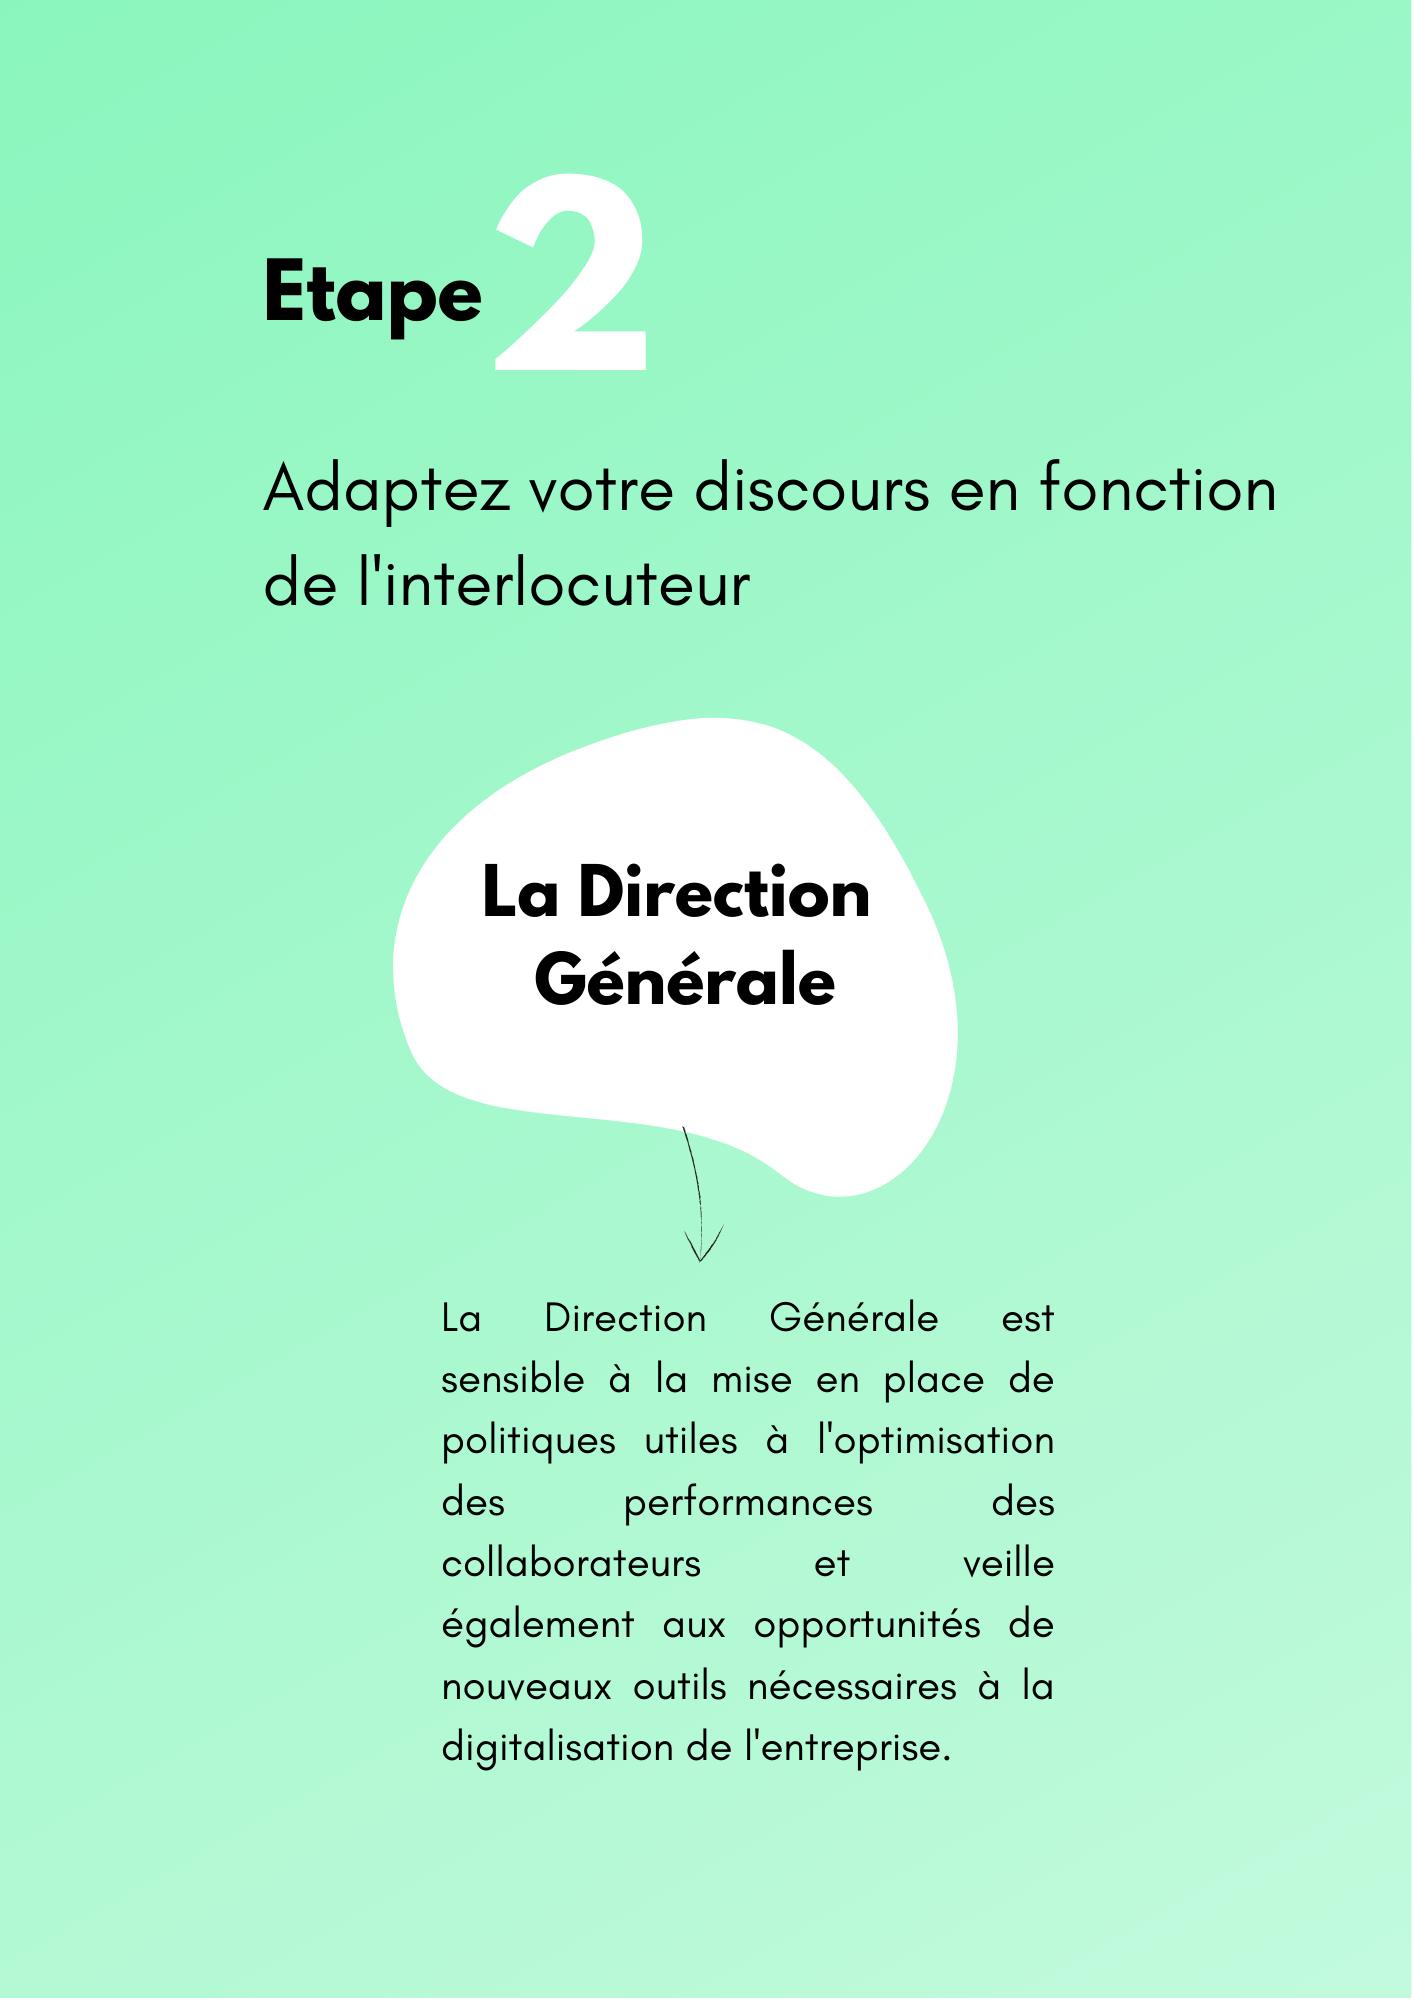 Etape 2 convaincre guide